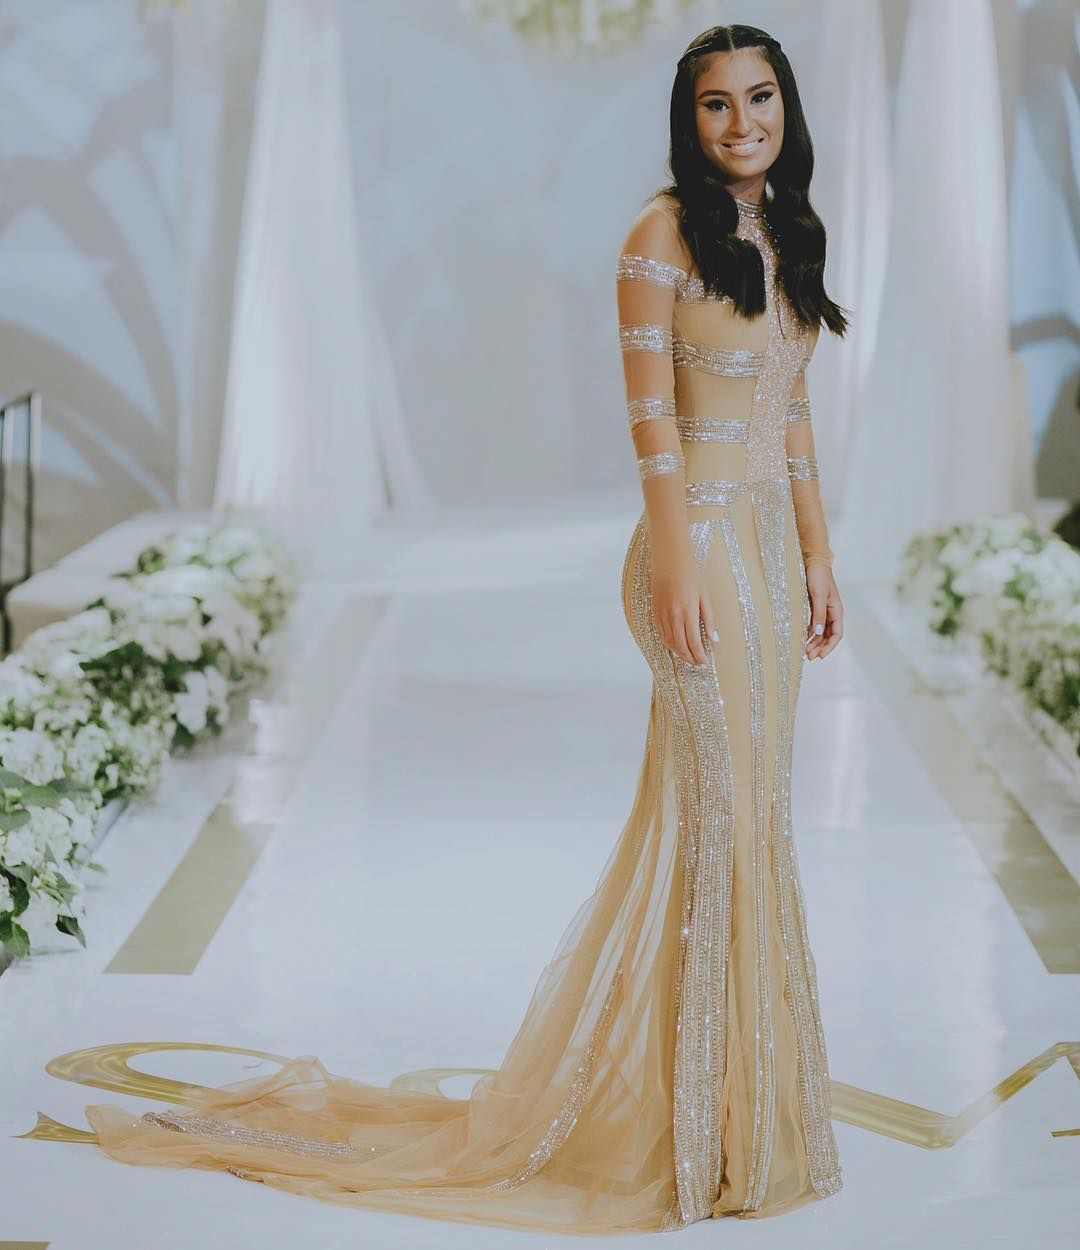 Beautiful Bridal Gowns St Louis Mo Ensign - Wedding Dress Ideas ...